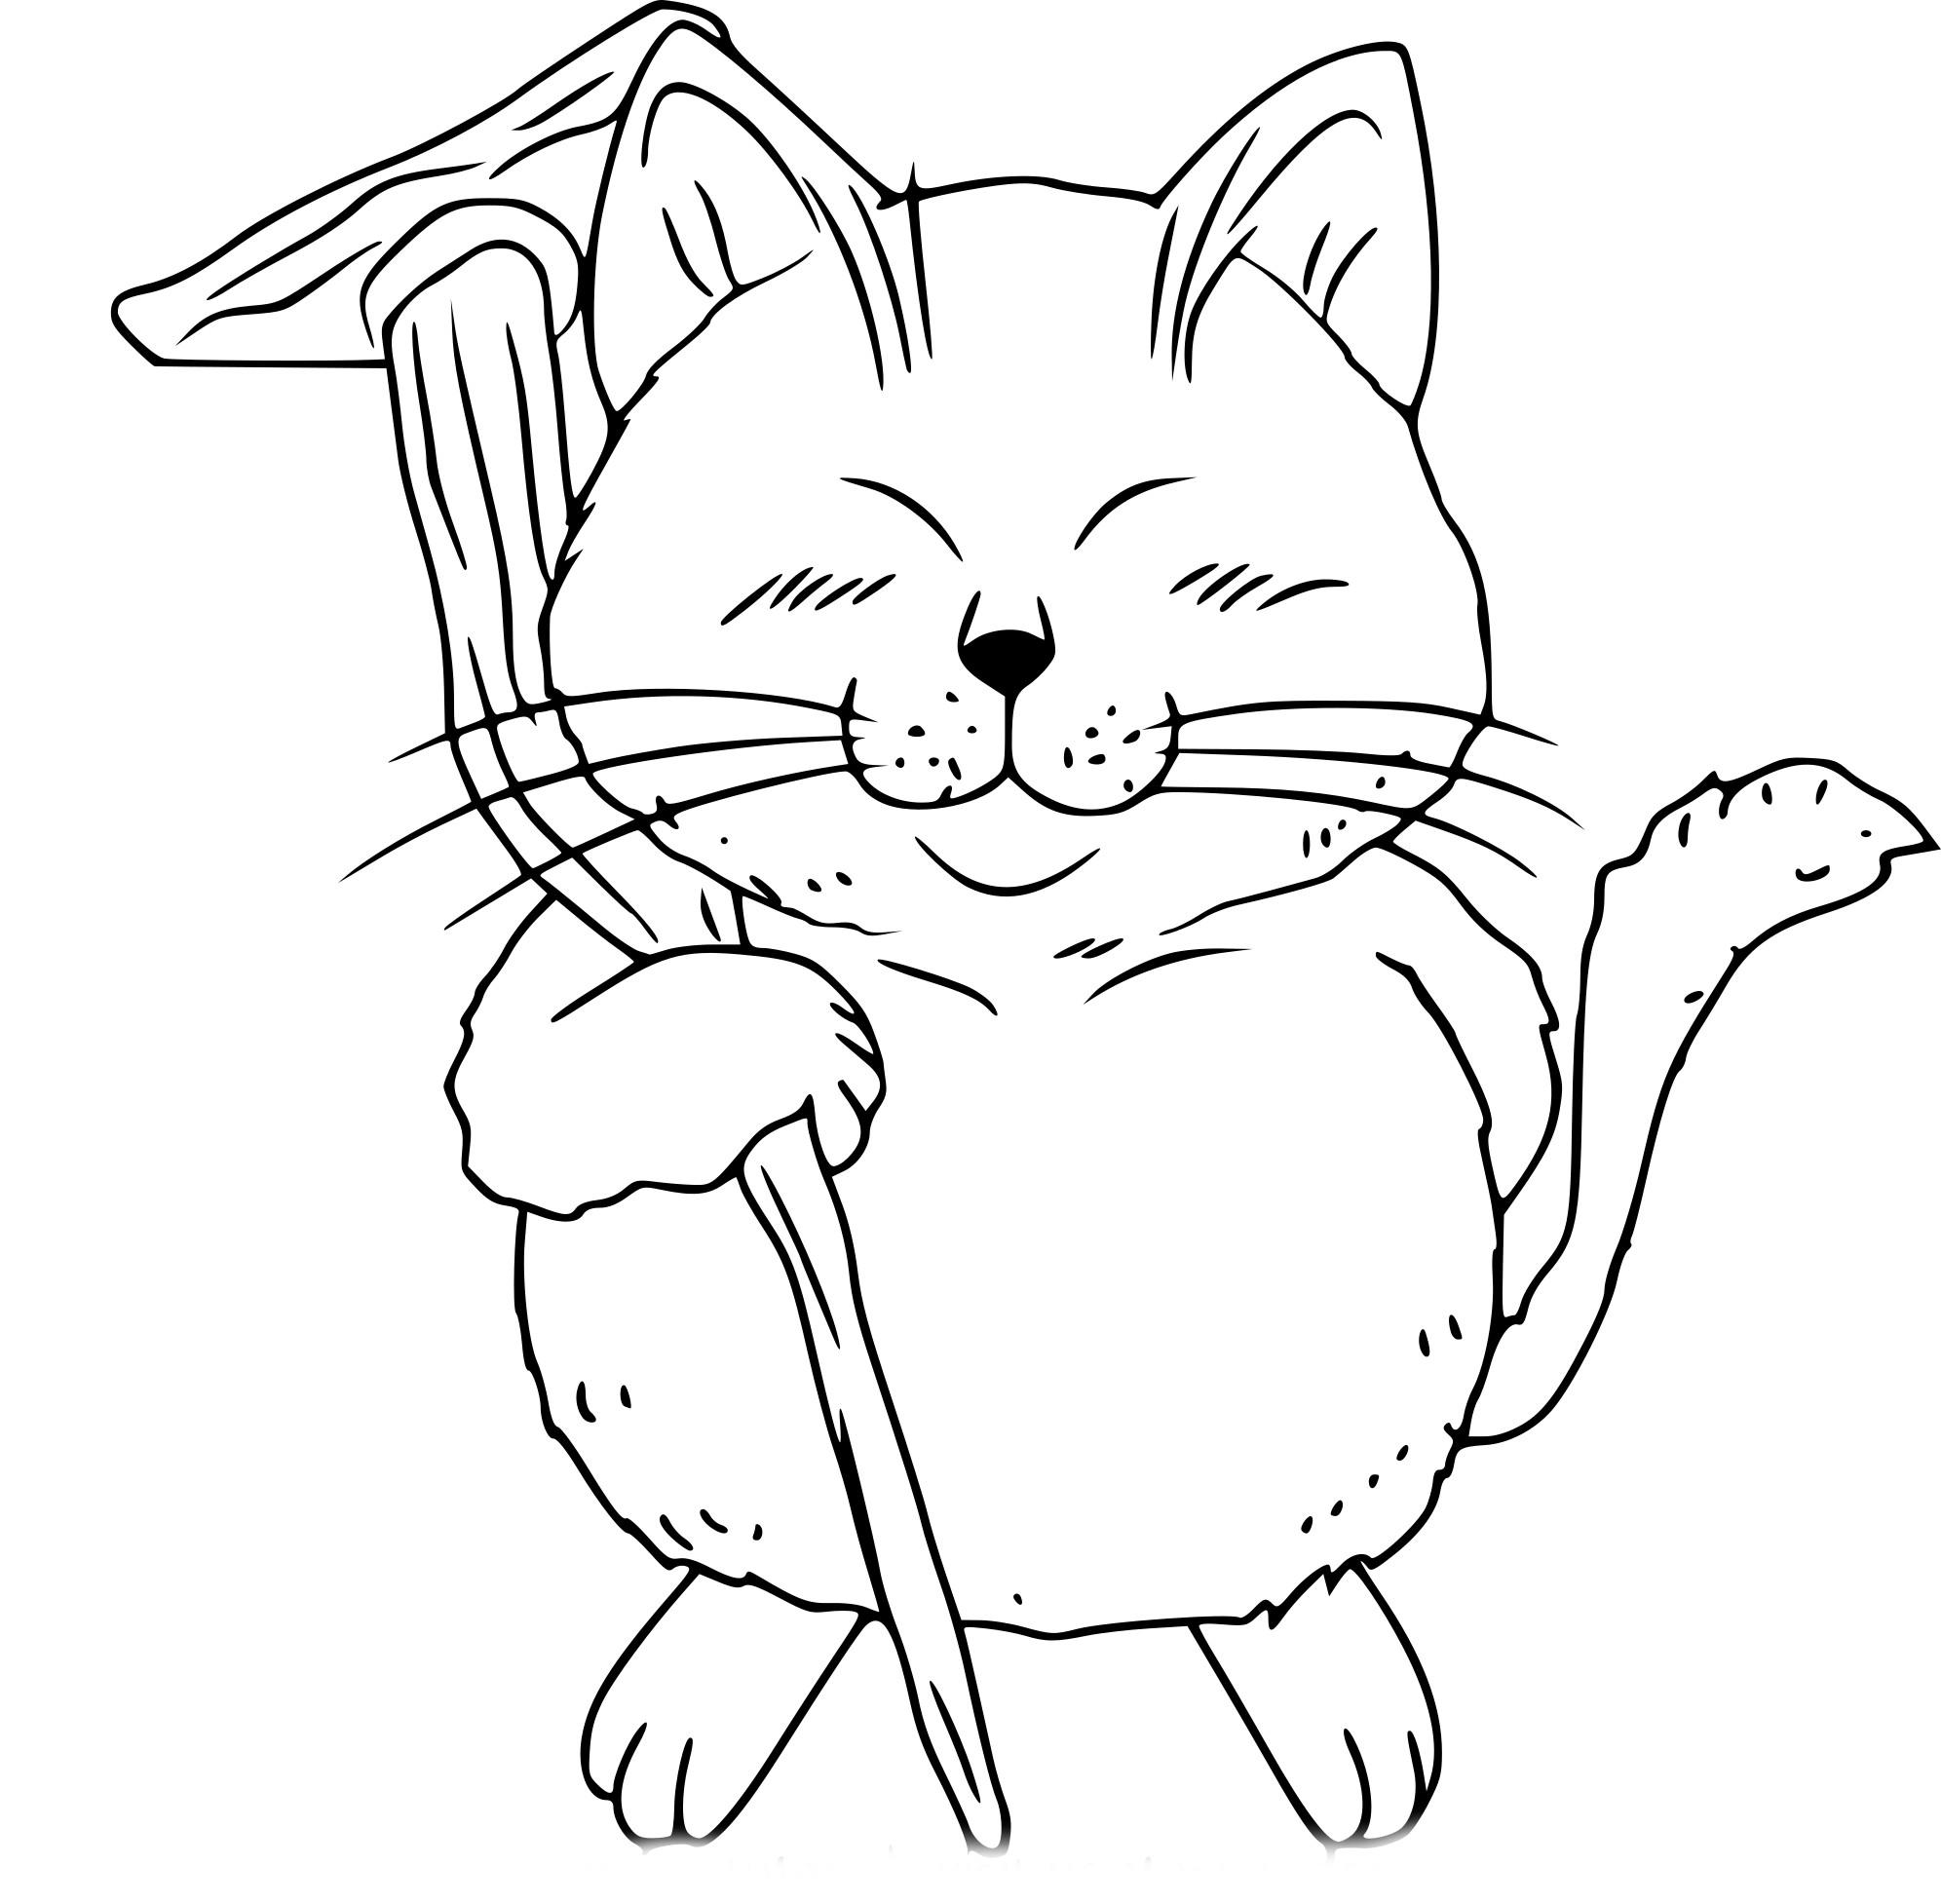 Coloriage Karin Dragon Ball Z à imprimer